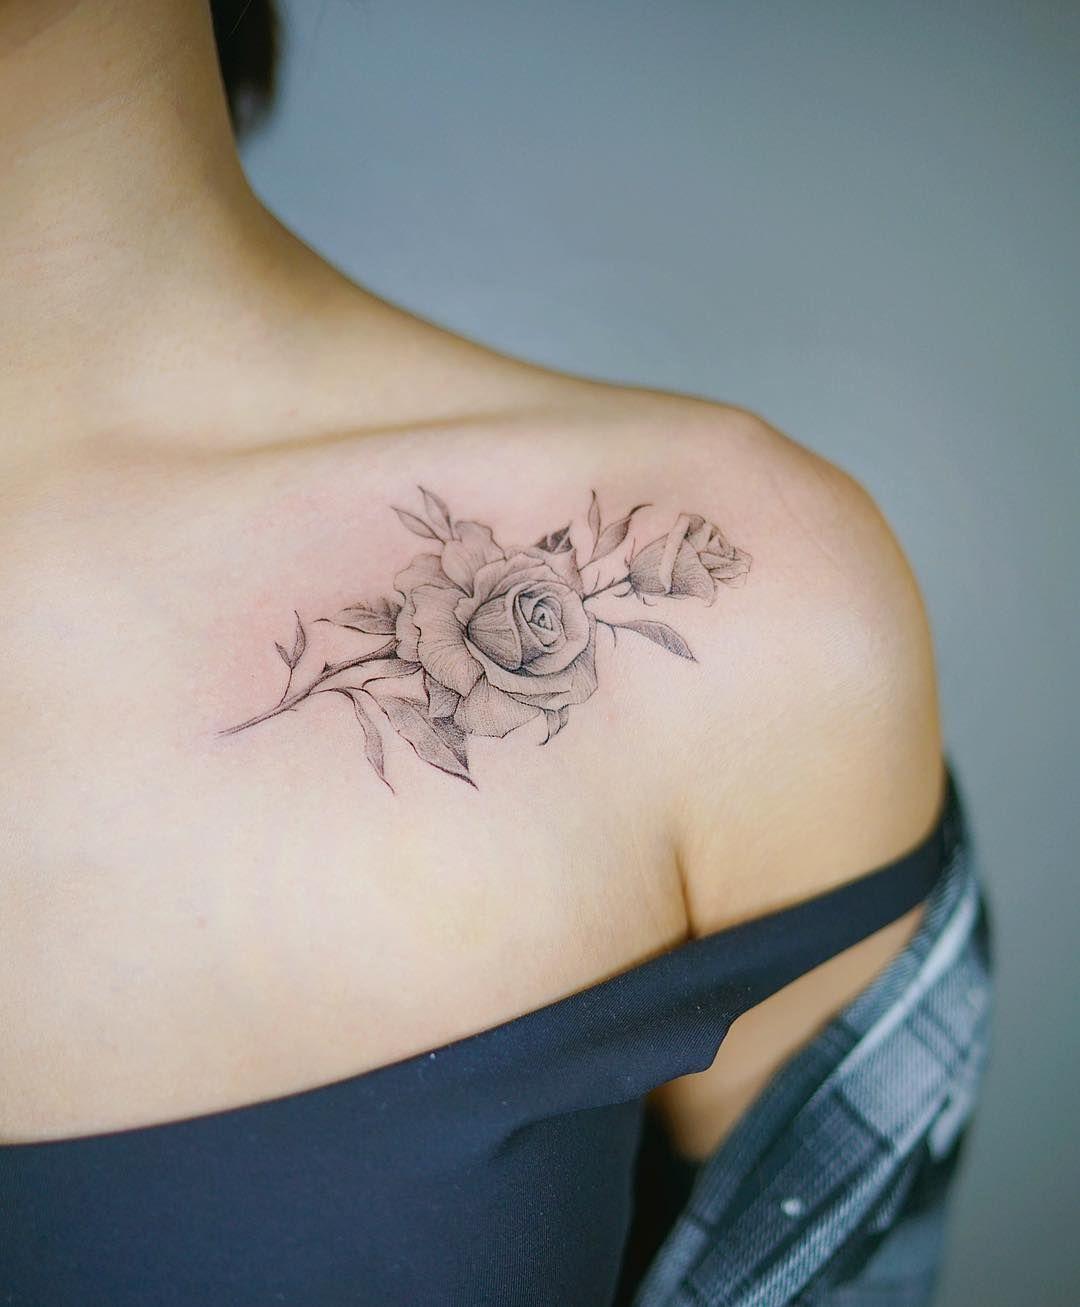 Pin Kayla Evans On Tattoo Ideas Elegant Tattoos Small Shoulder within size 1080 X 1307